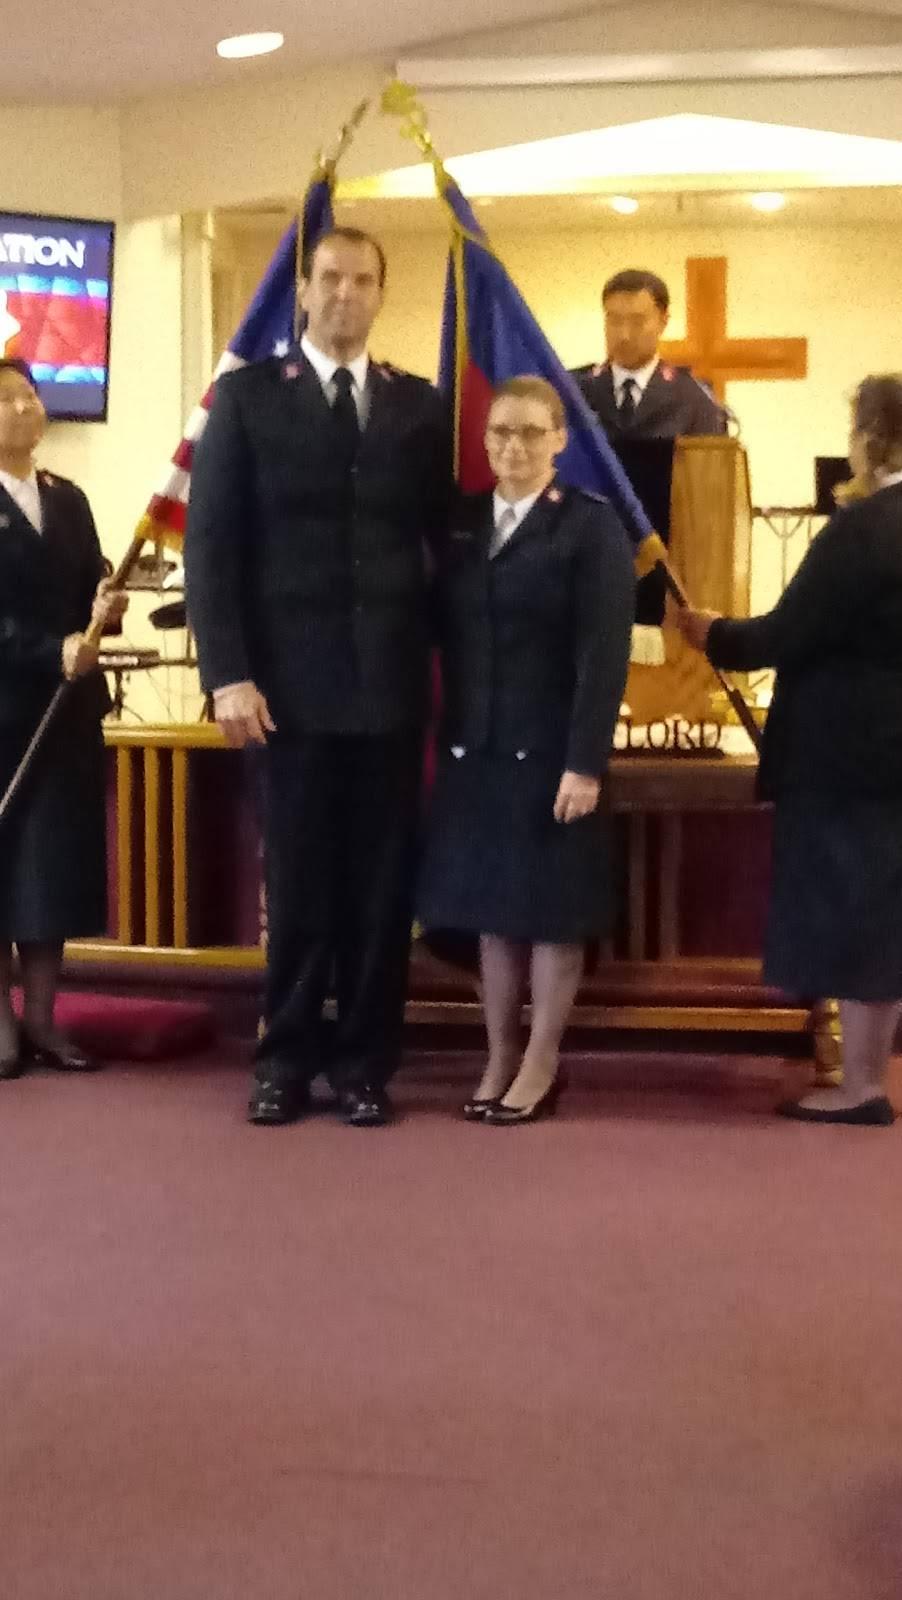 Salvation Army - church  | Photo 2 of 3 | Address: 5327 Orcutt Ln, Richmond, VA 23224, USA | Phone: (804) 745-5524